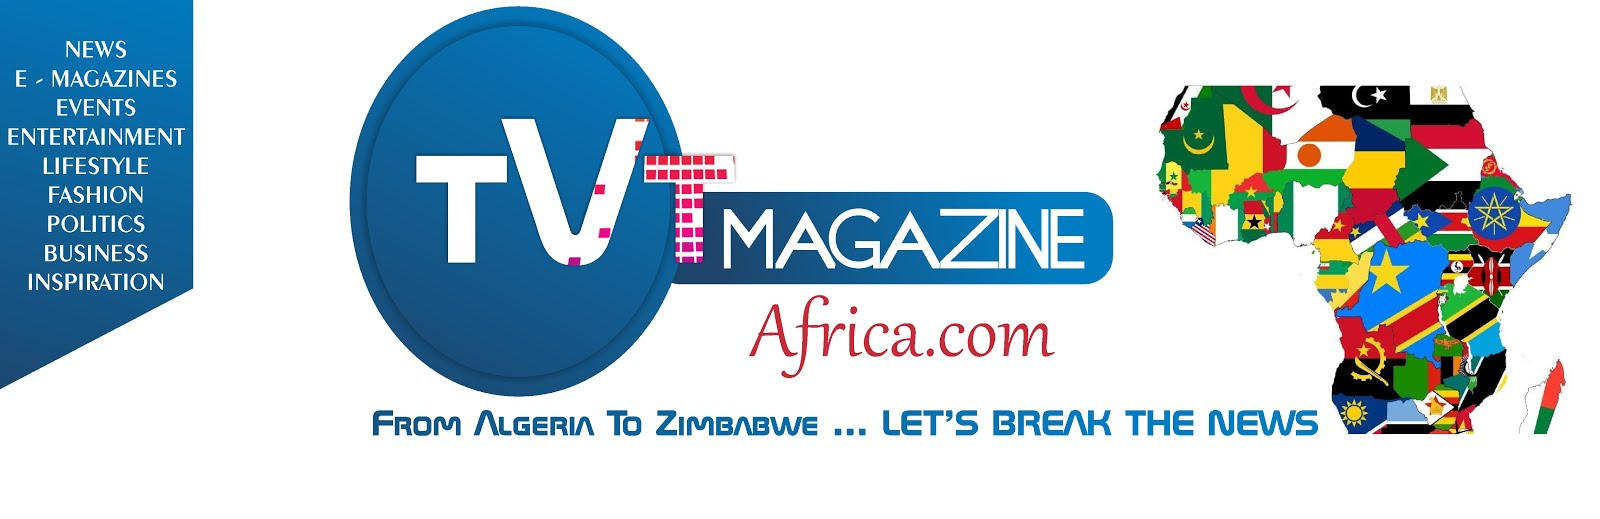 TVTmagazine Africa